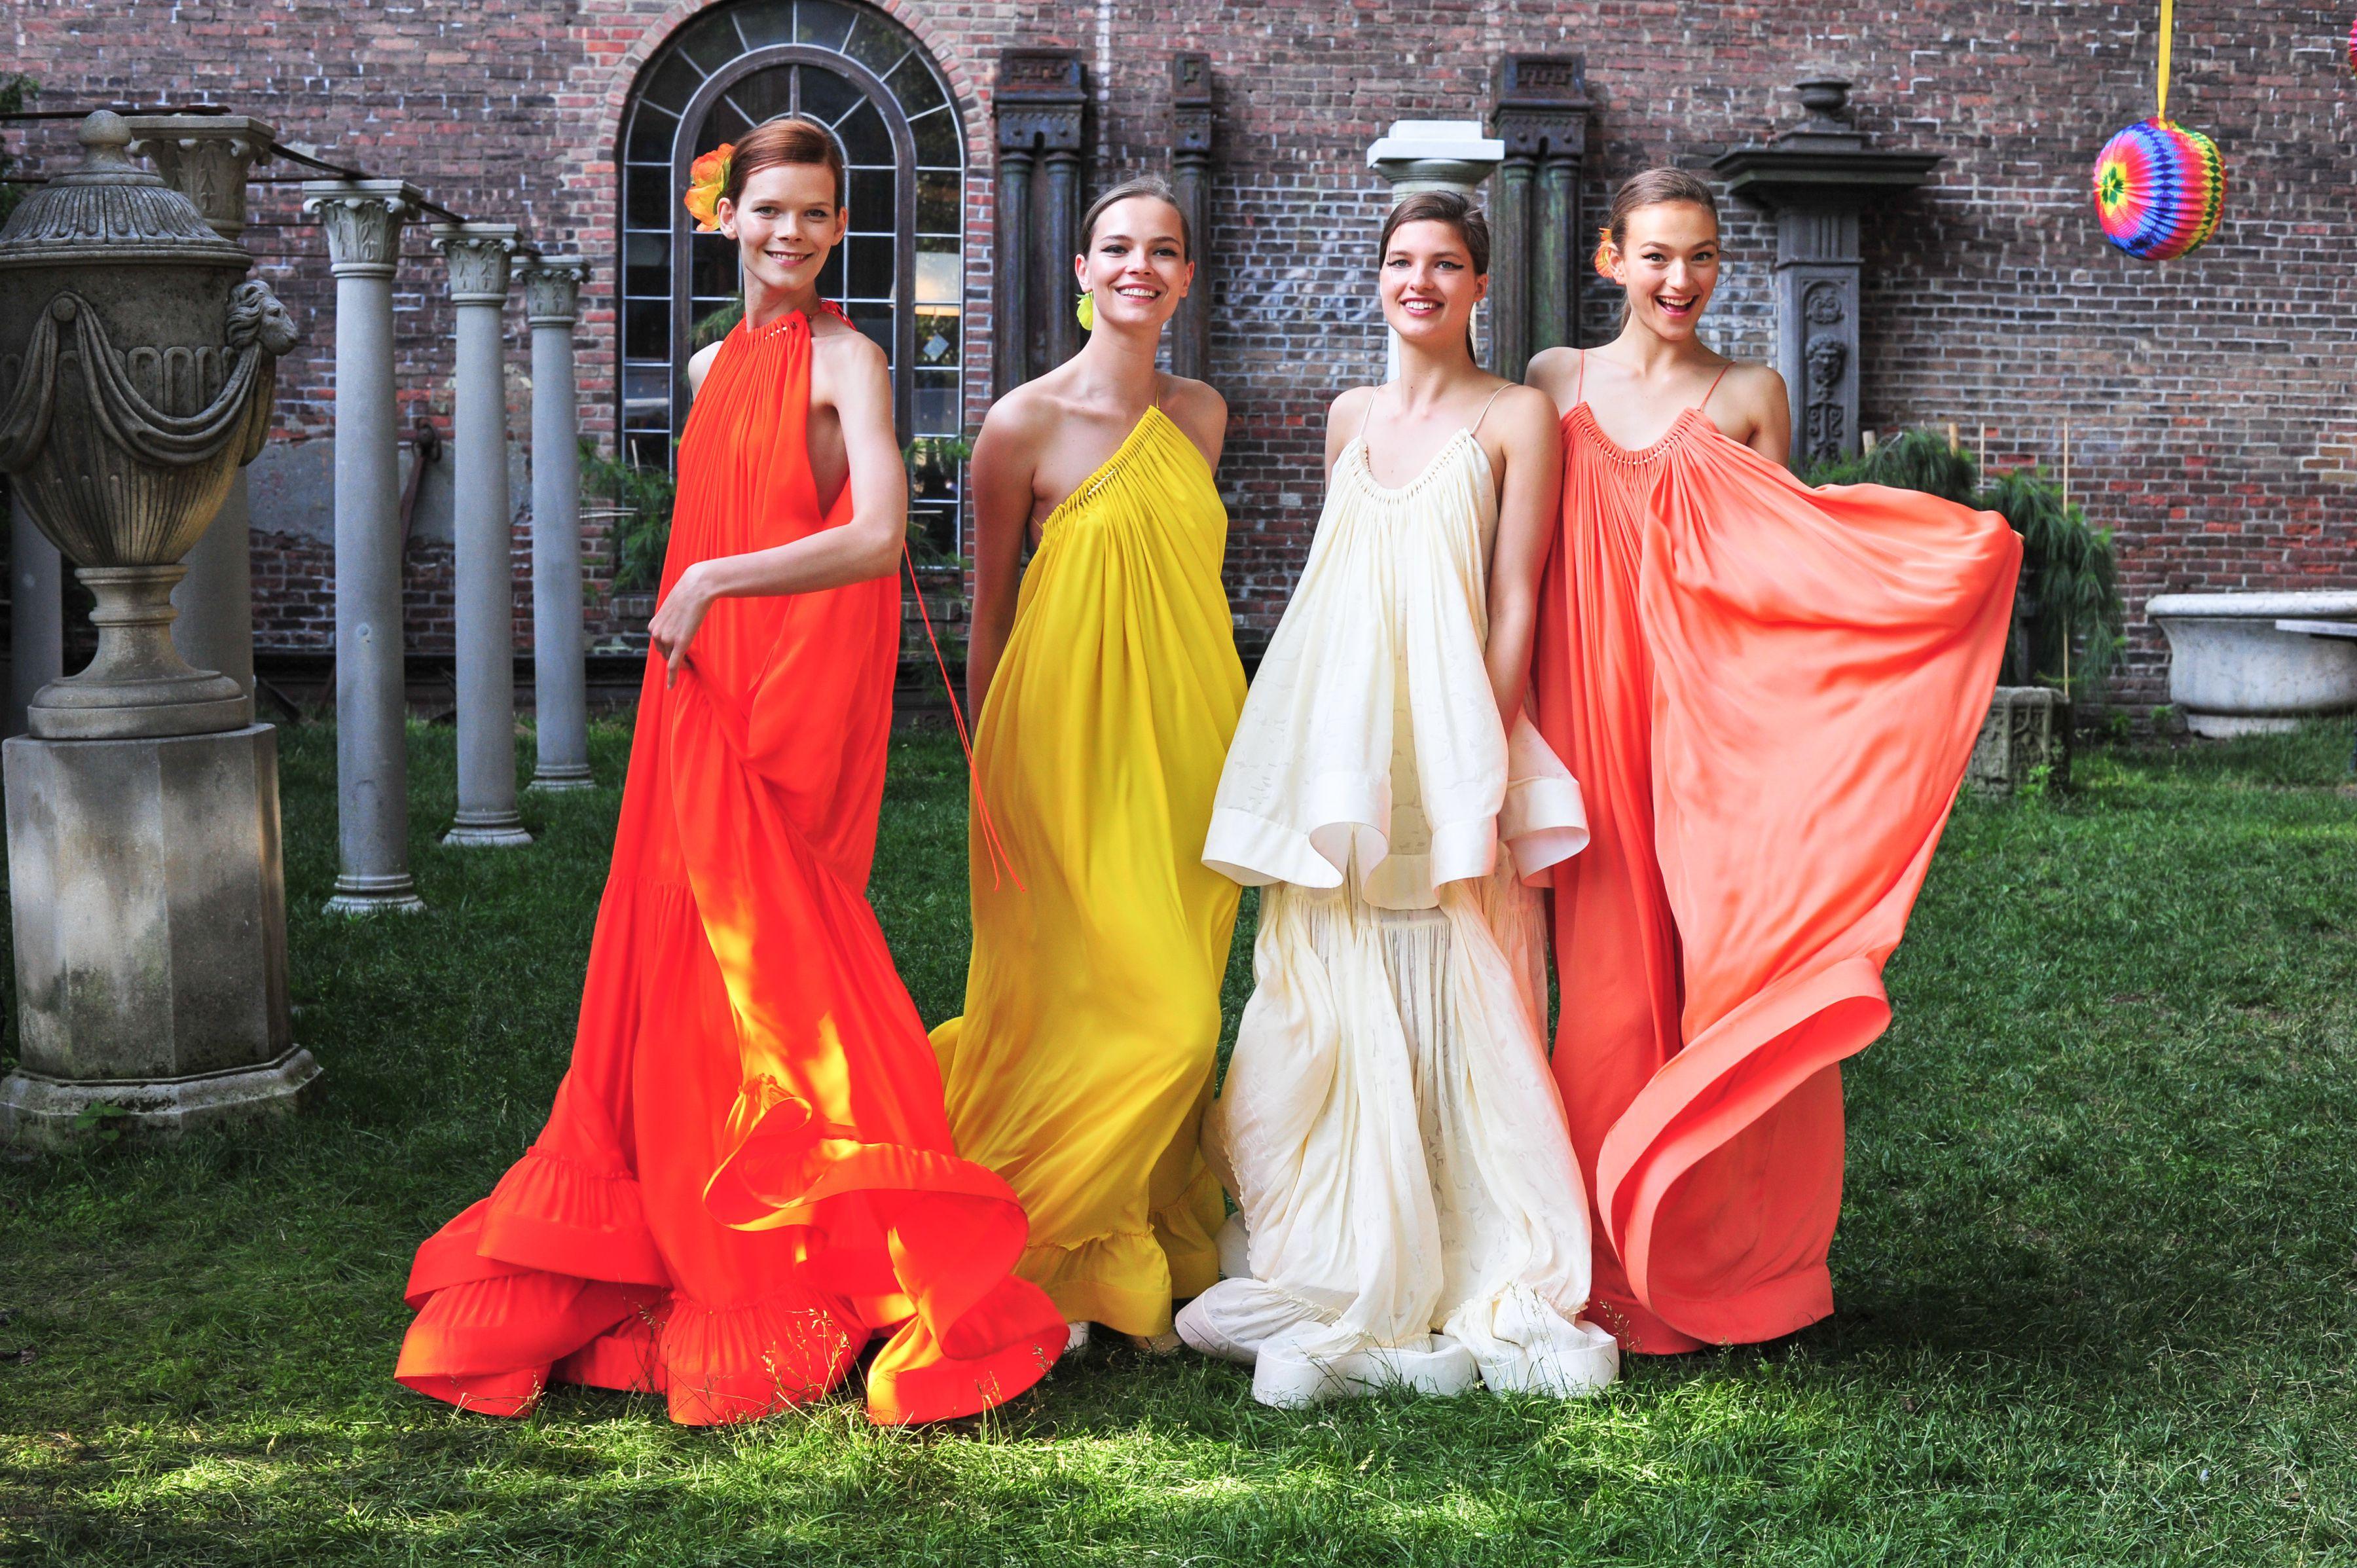 resort 2016, cuba, stella mccartney, fashion show